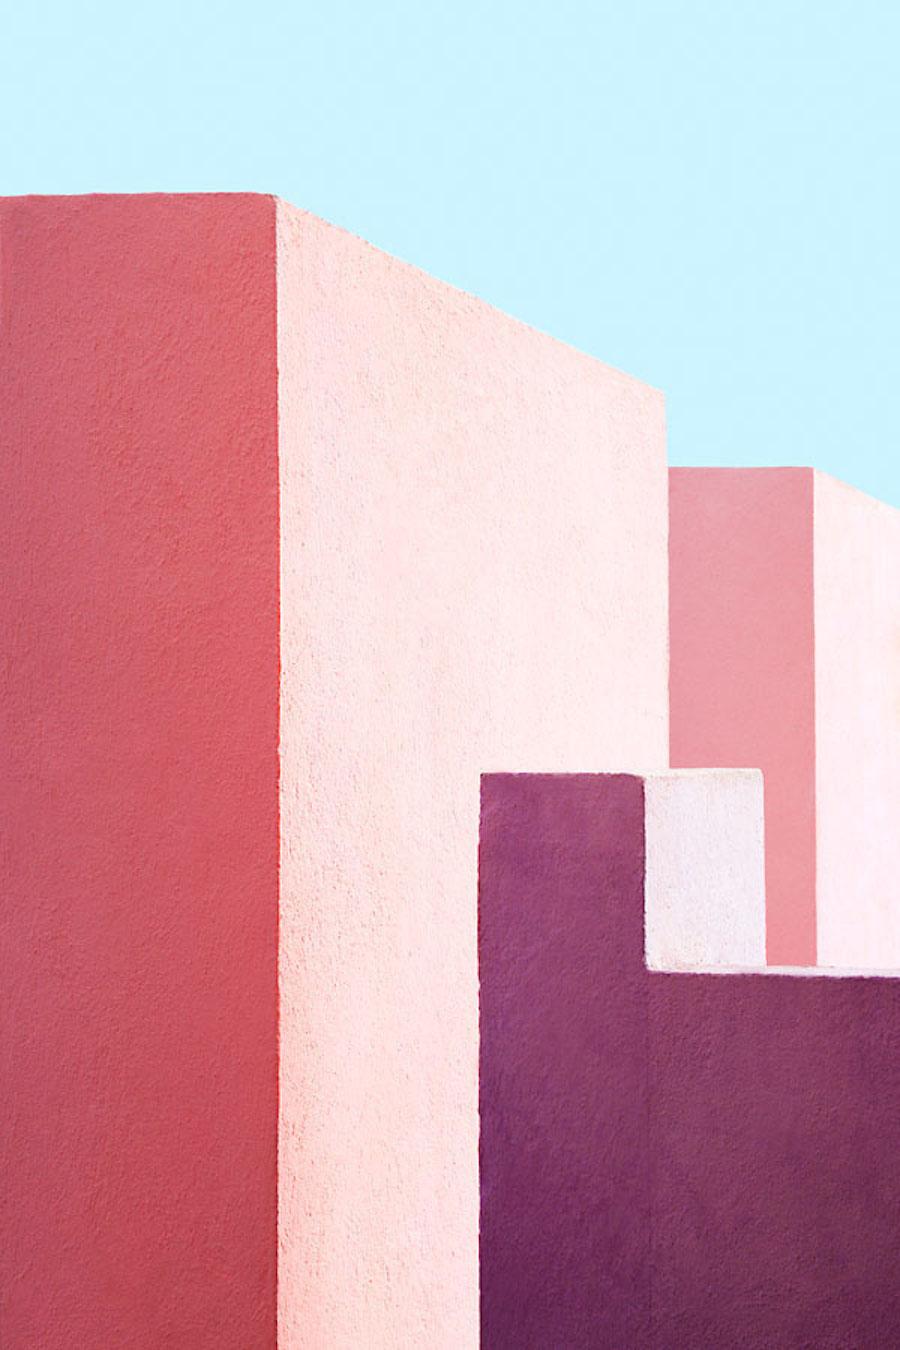 architecturespain-14.jpg